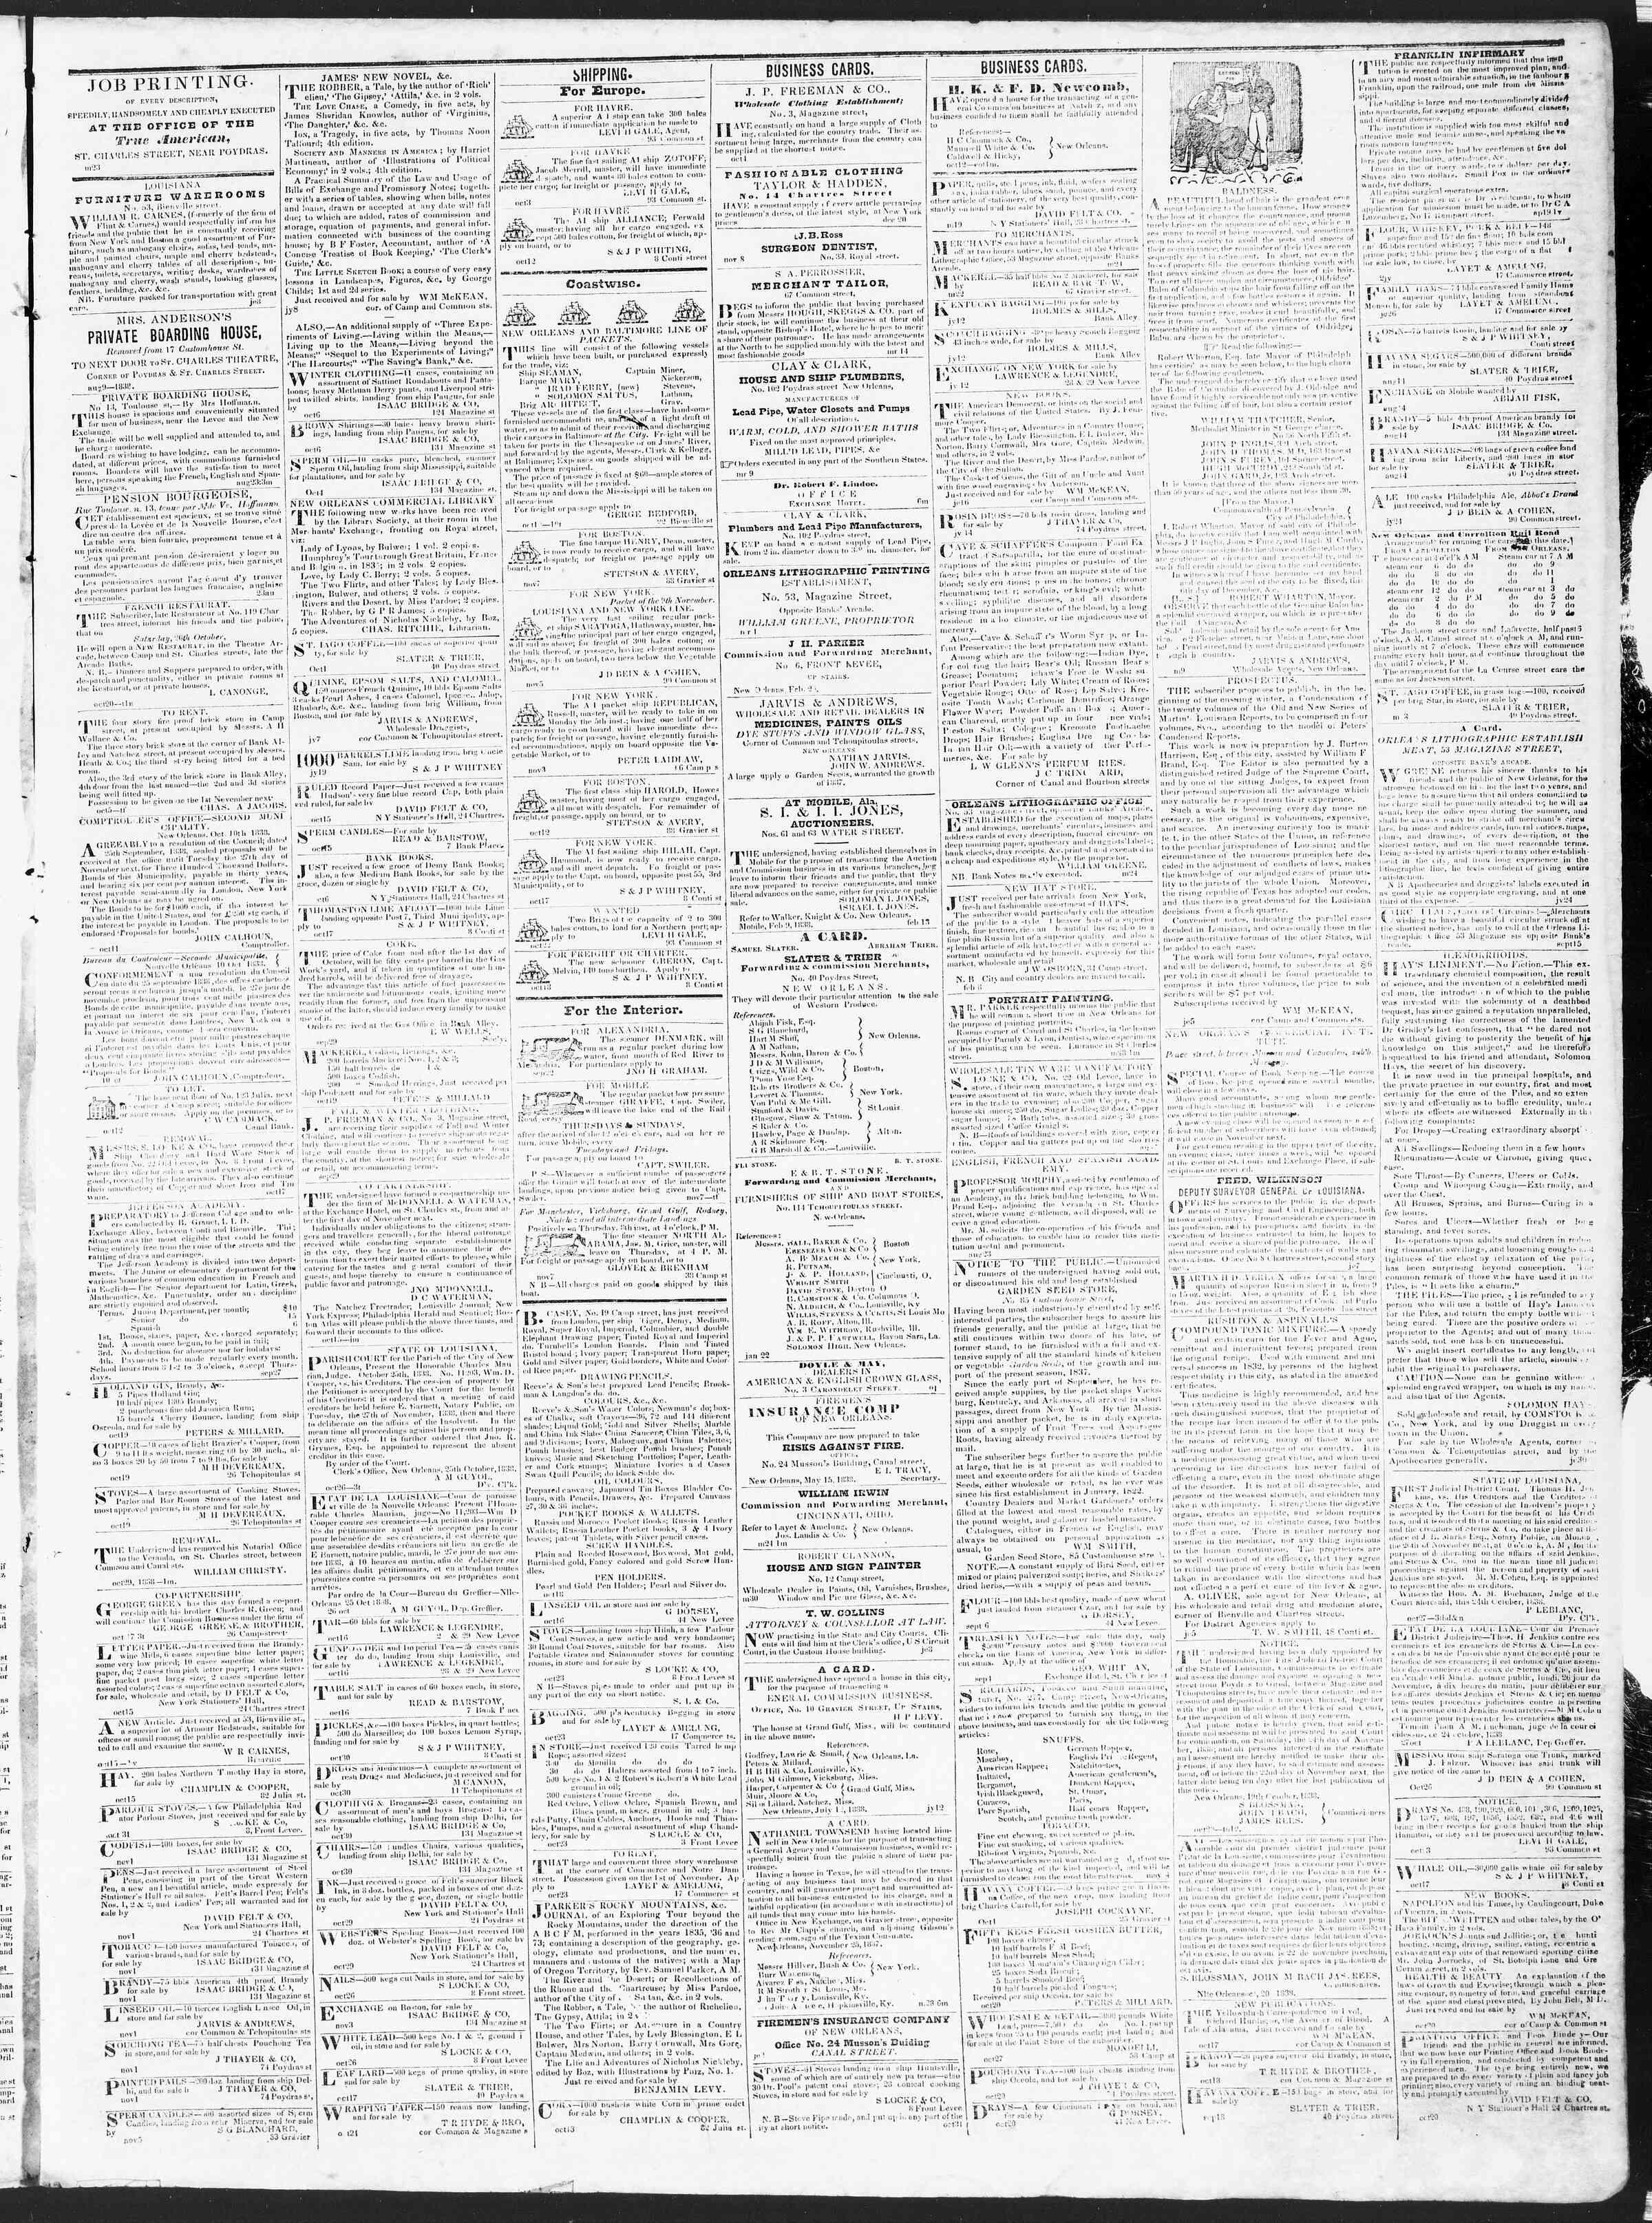 November 8, 1838 Tarihli True American Gazetesi Sayfa 3